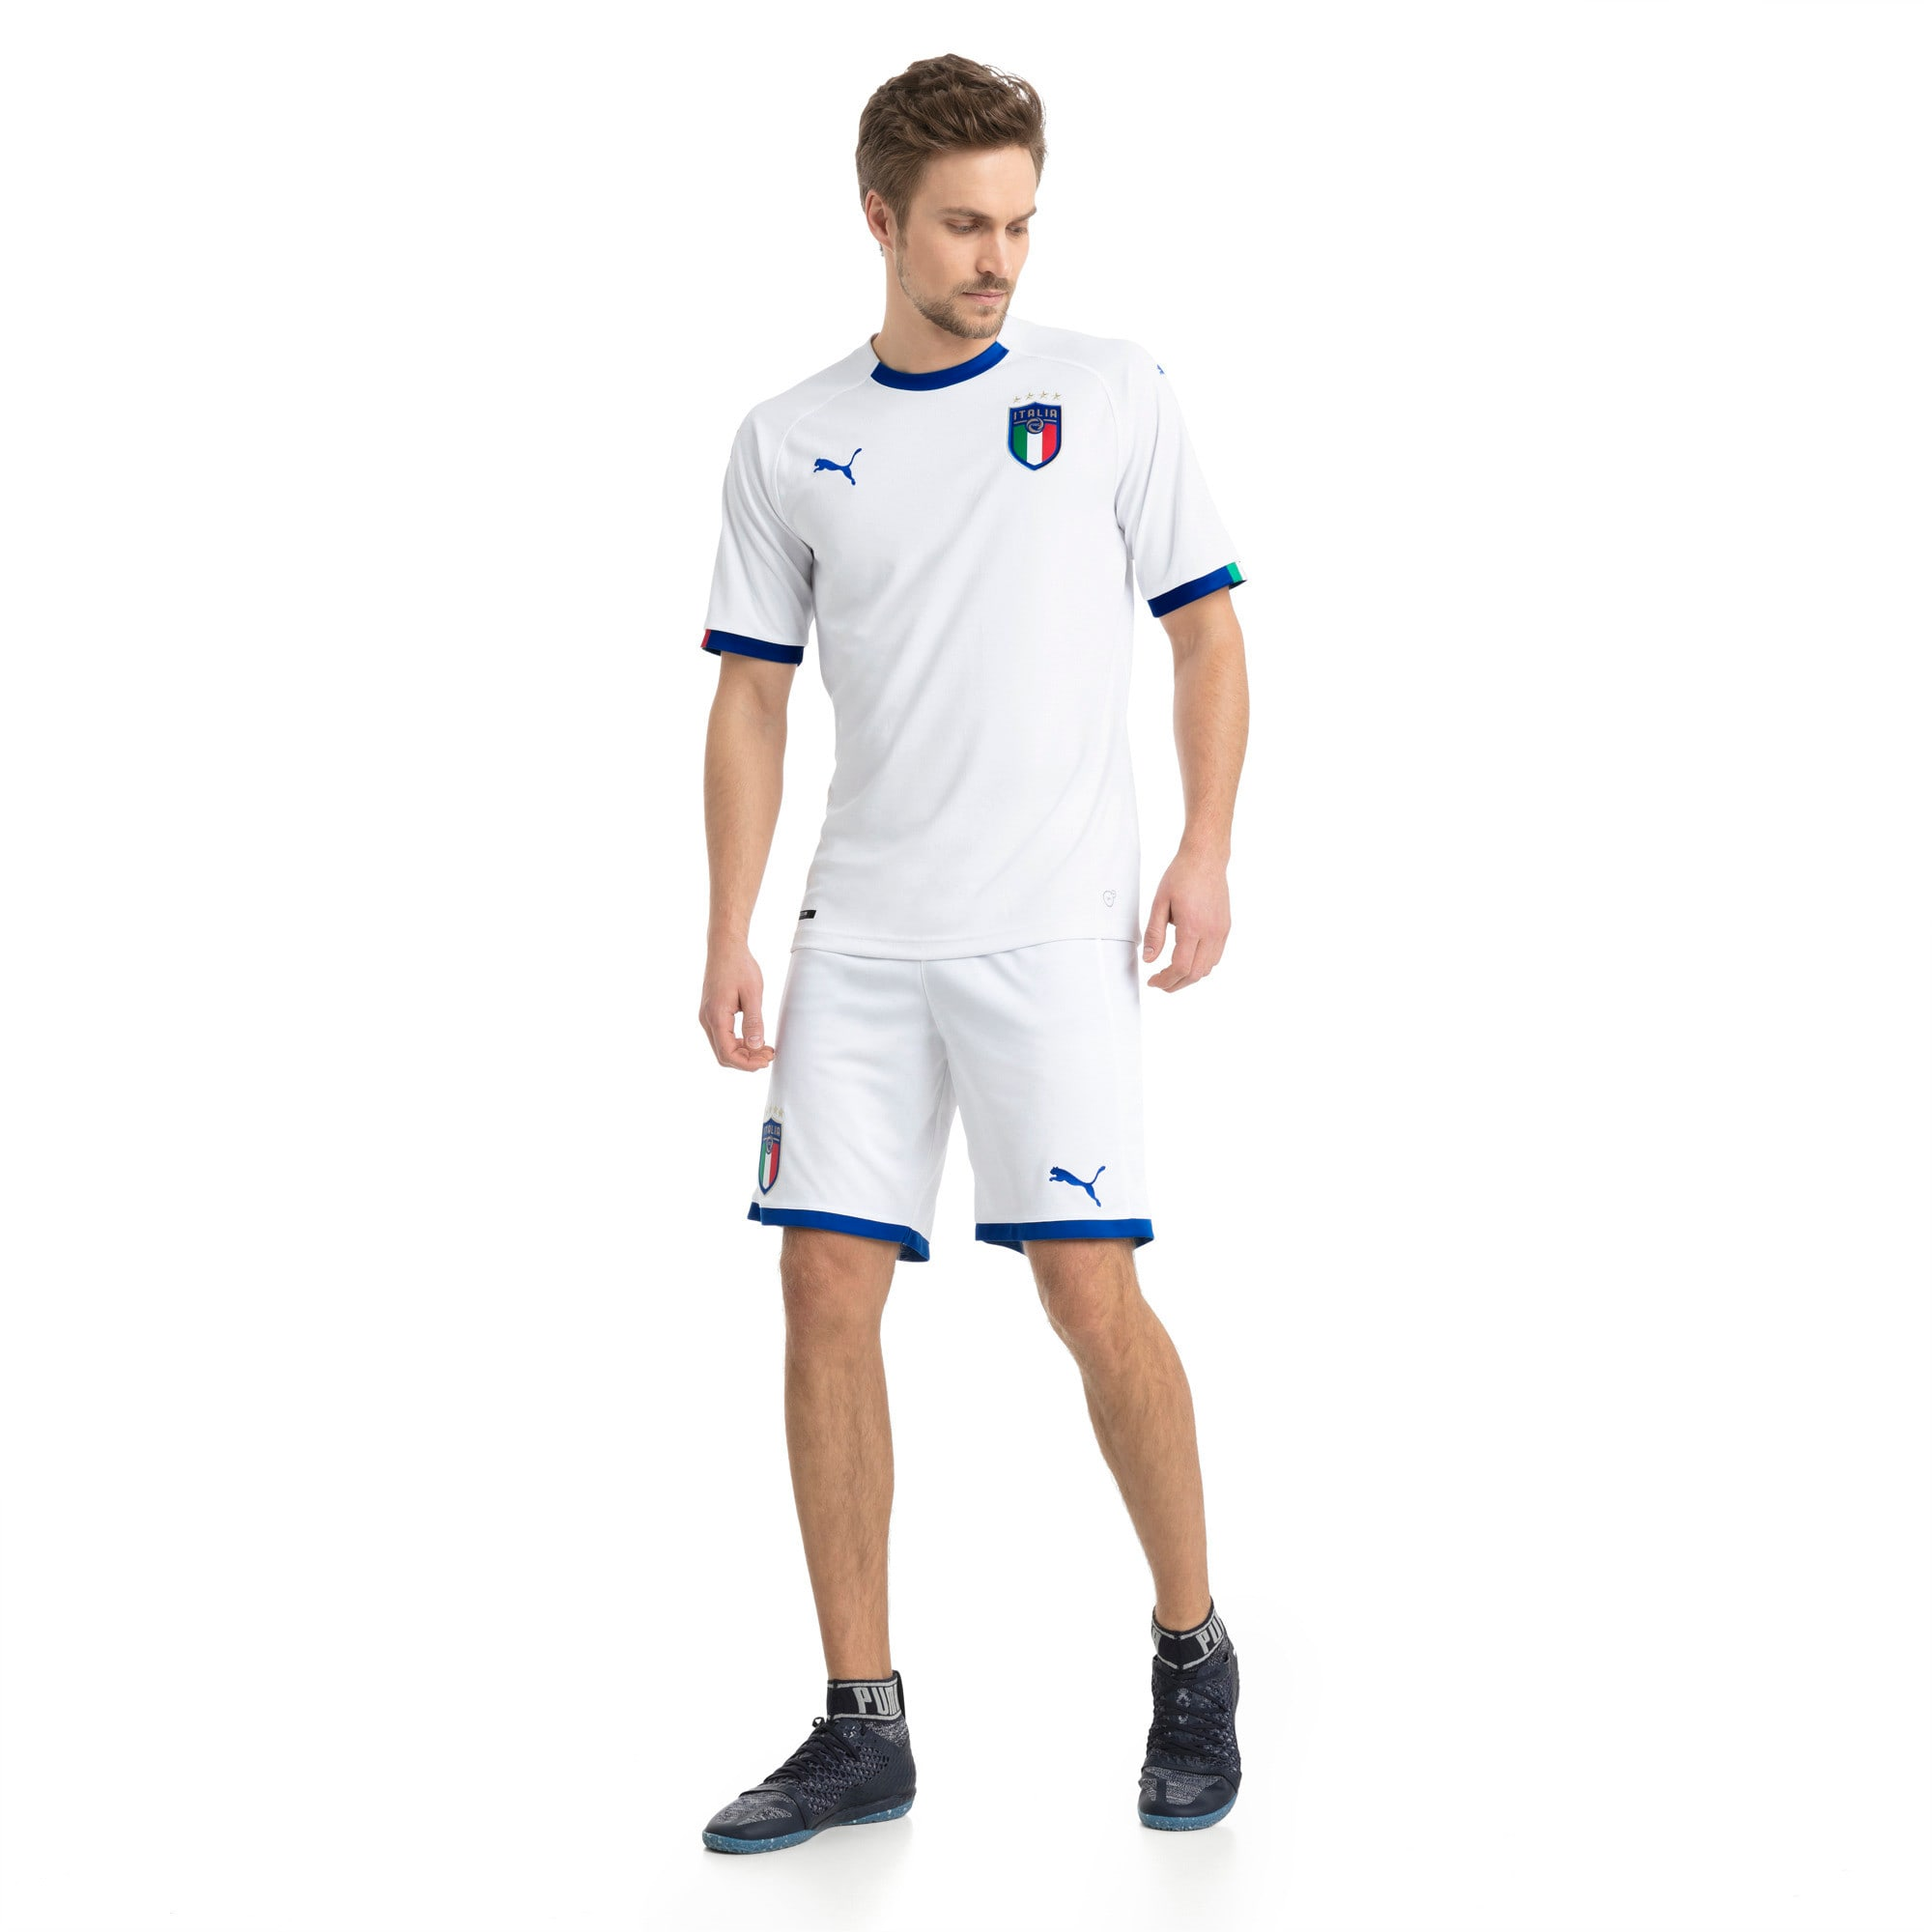 Thumbnail 3 of FIGC ITALIA アウェイ レプリカ SSシャツ 半袖, Puma White-Team Power Blue, medium-JPN